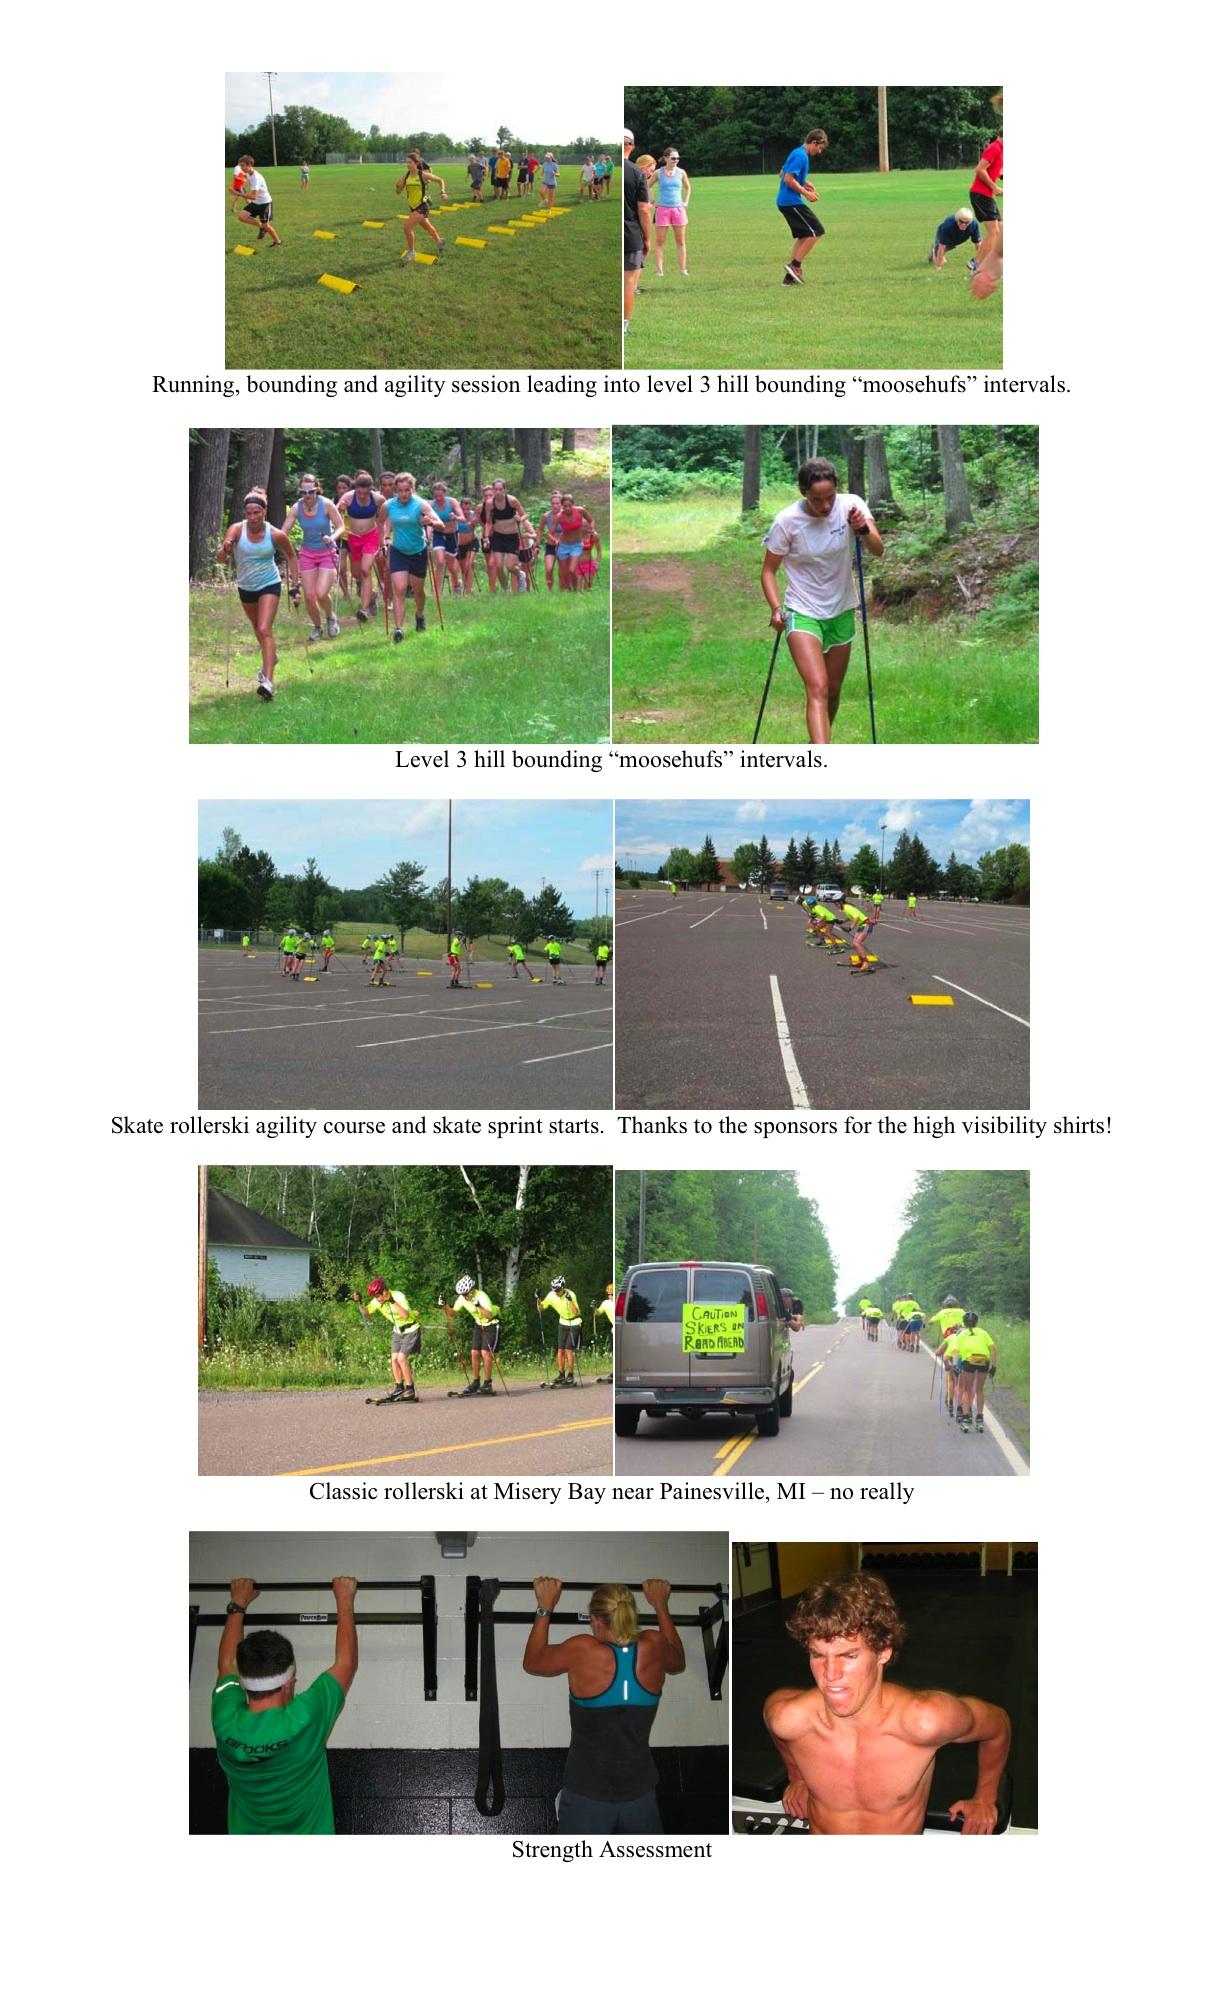 https://fasterskier.com/wp-content/blogs.dir/1/files/2010/08/USSA-National-J2-Talent-Camp-pics.jpg